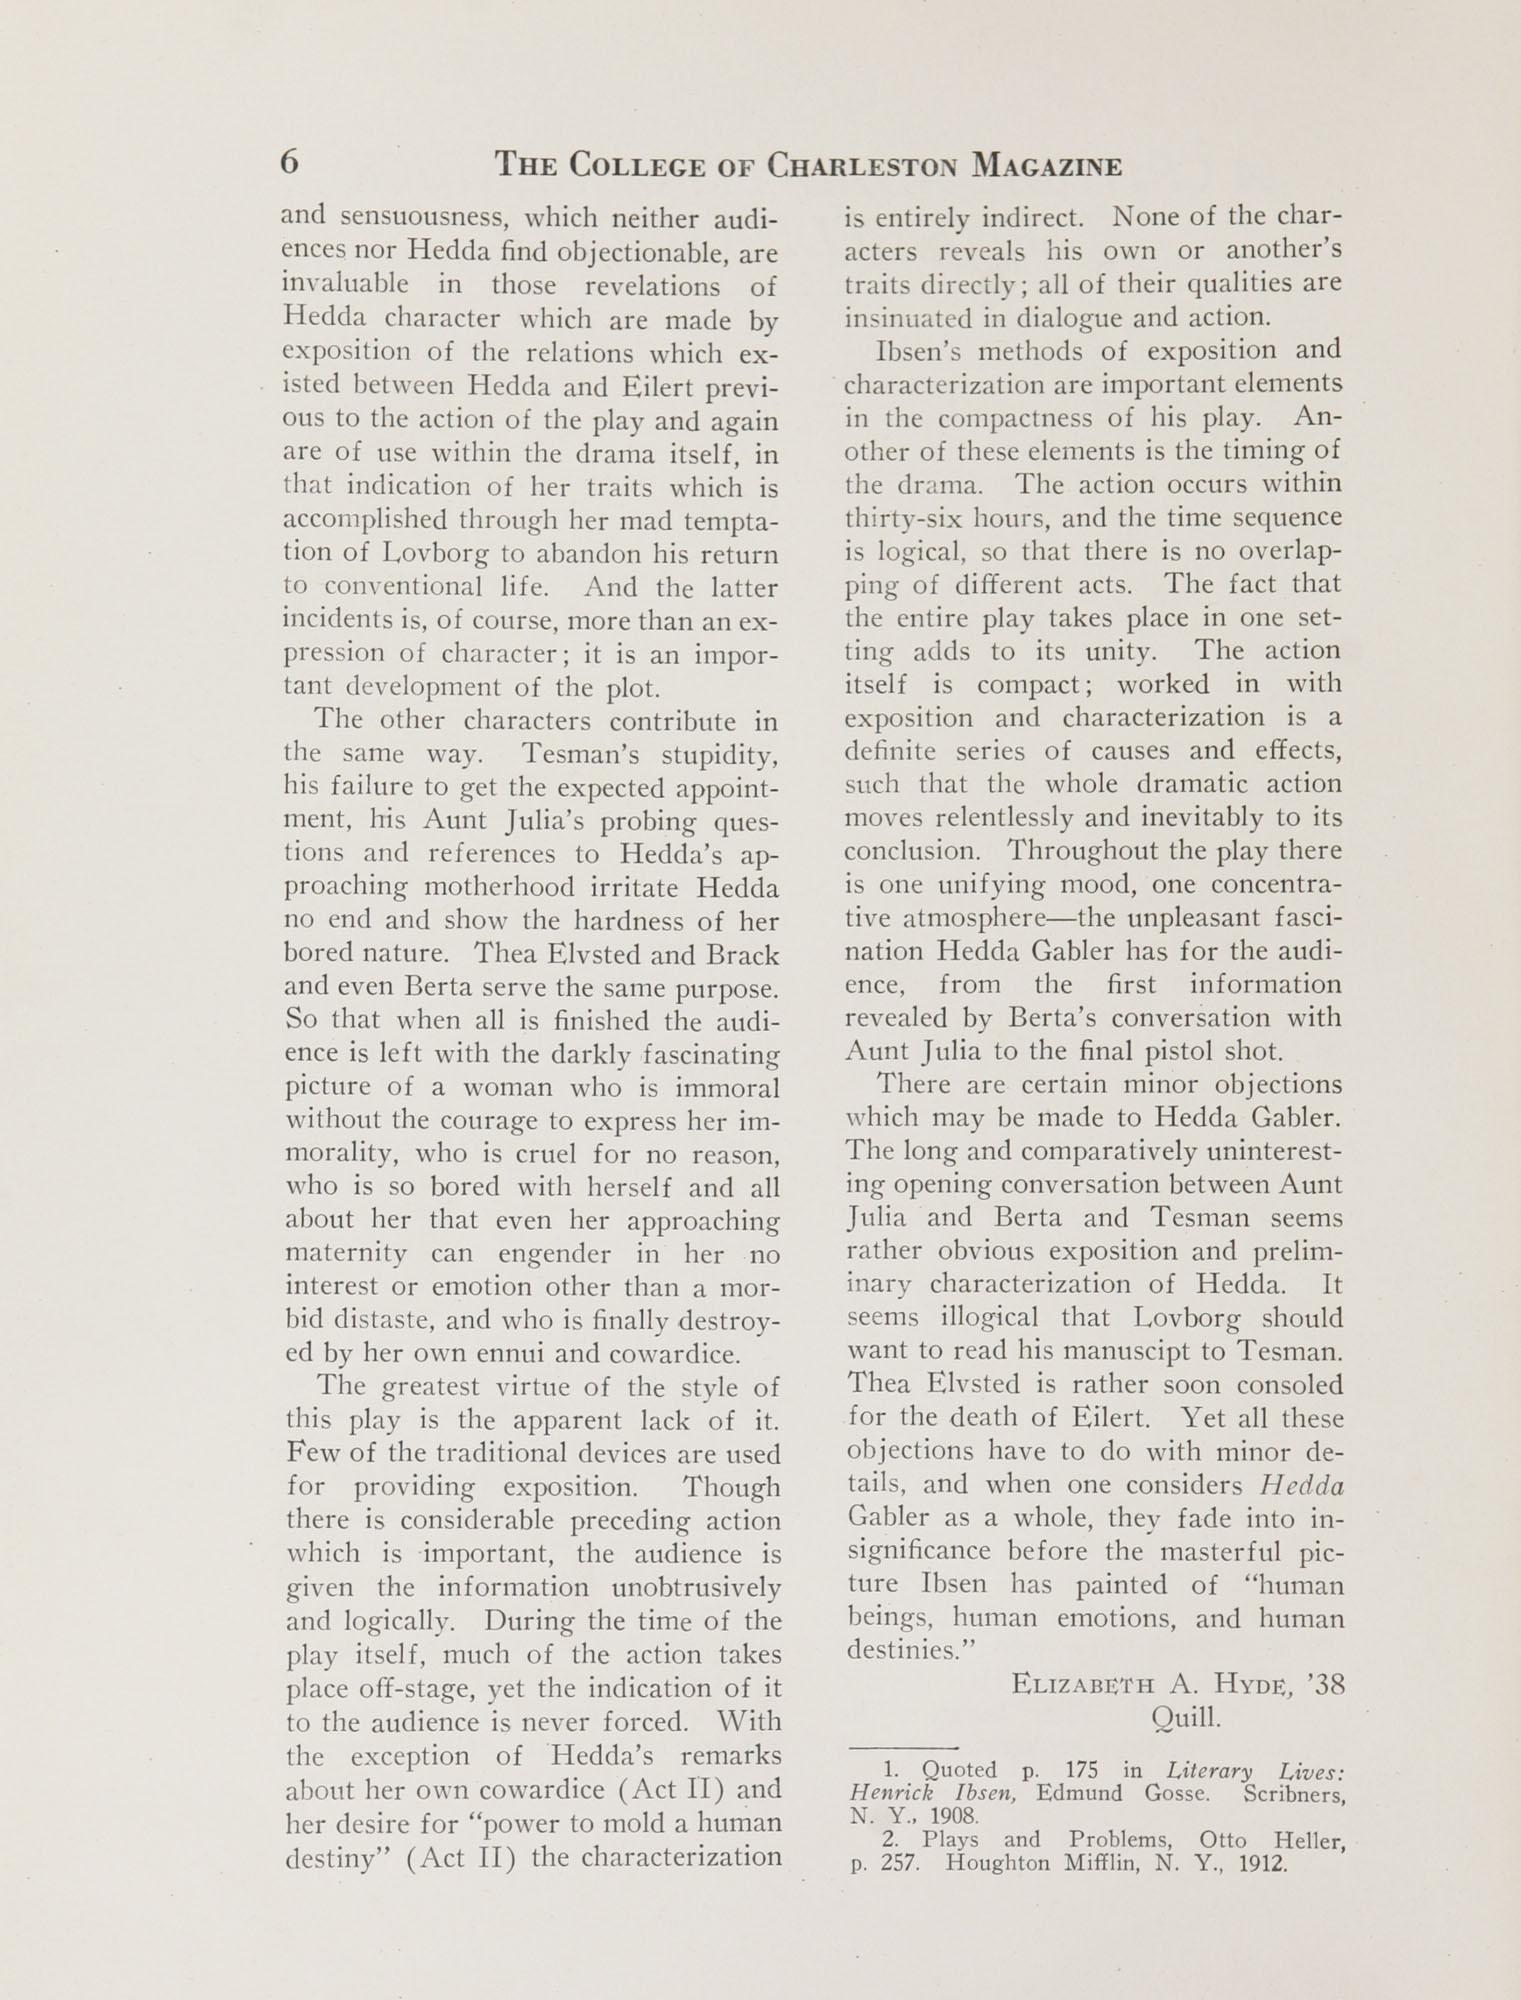 College of Charleston Magazine, 1937-1938, Vol. XXXXI No. 1, page 6